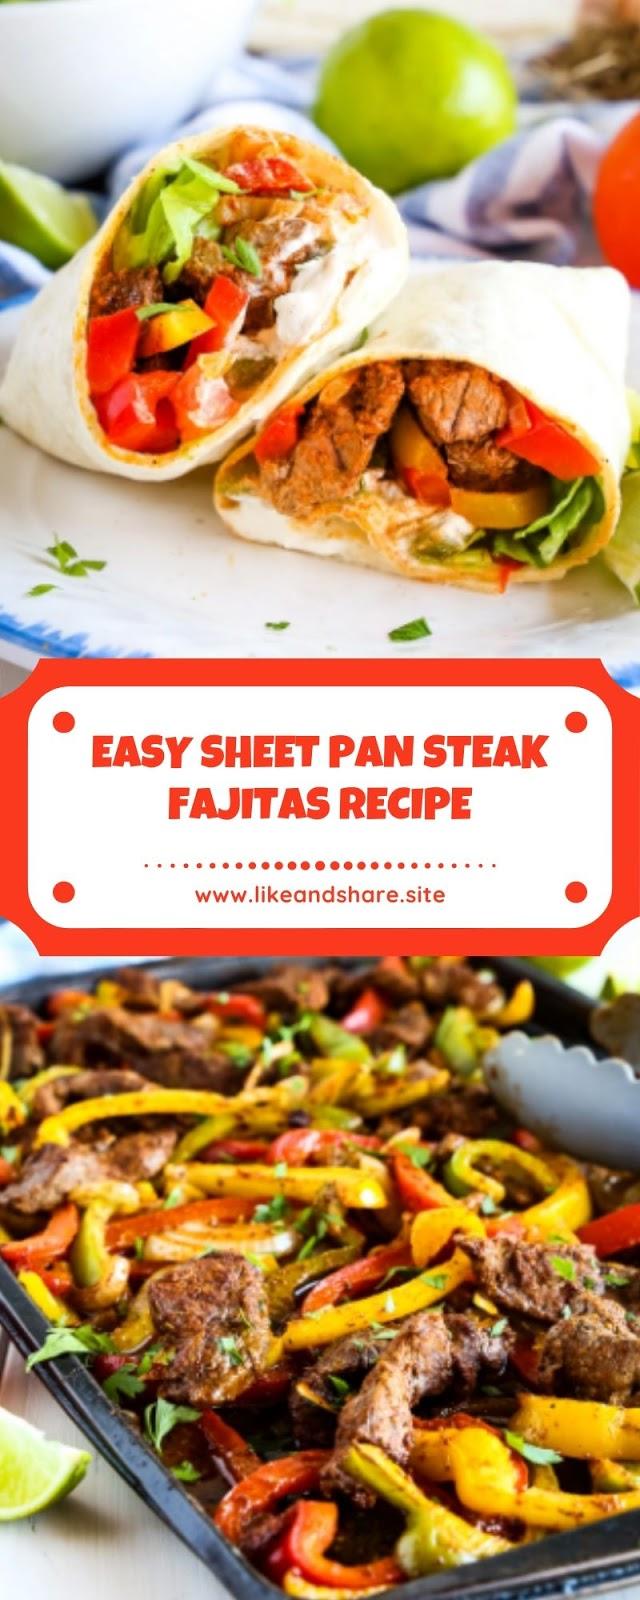 EASY SHEET PAN STEAK FAJITAS RECIPE